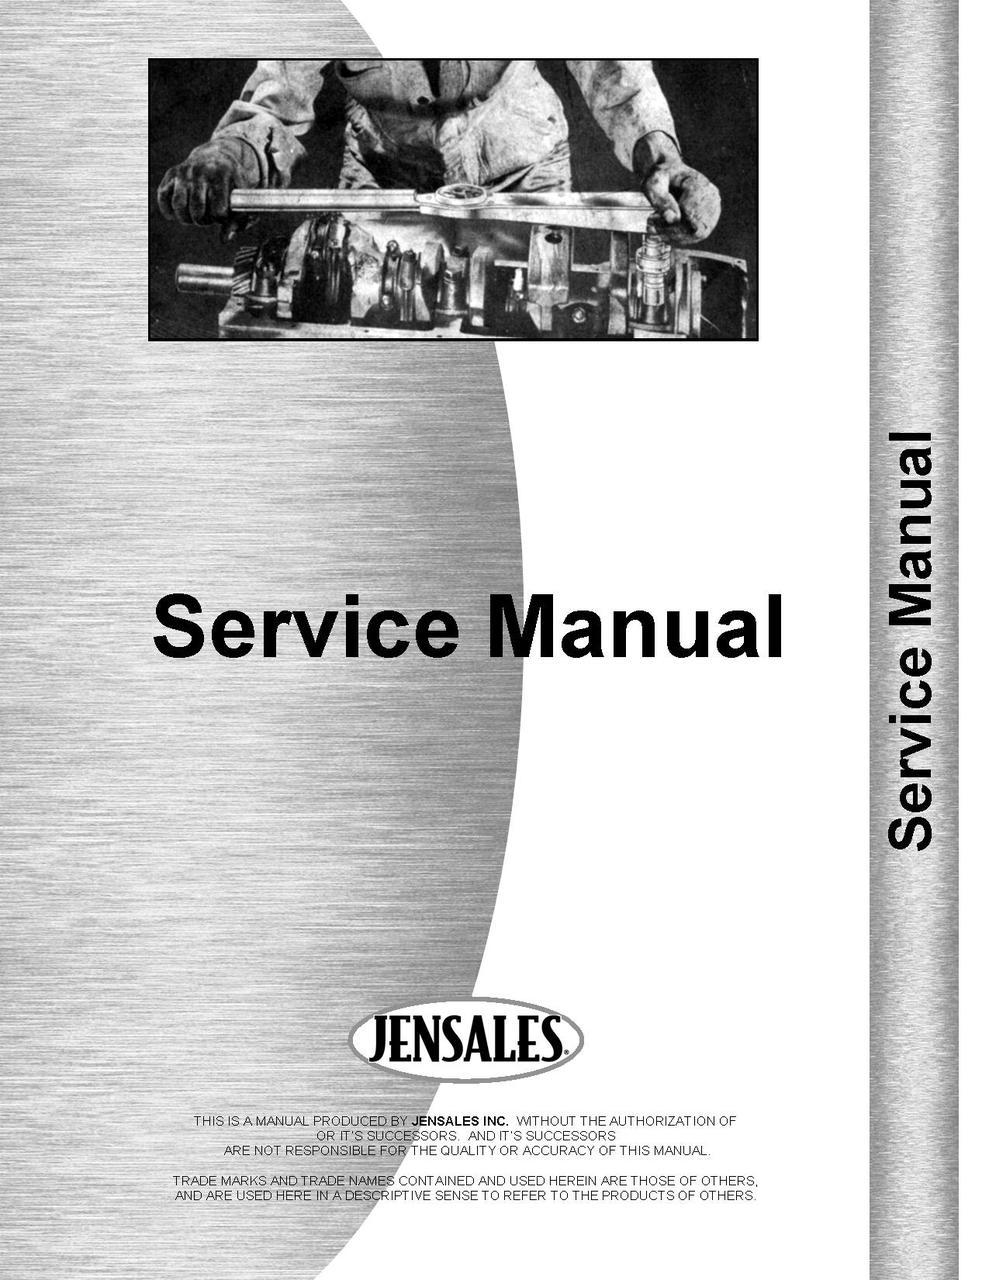 International Harvester 460 Tractor Service Manual (HTIH-S460560)